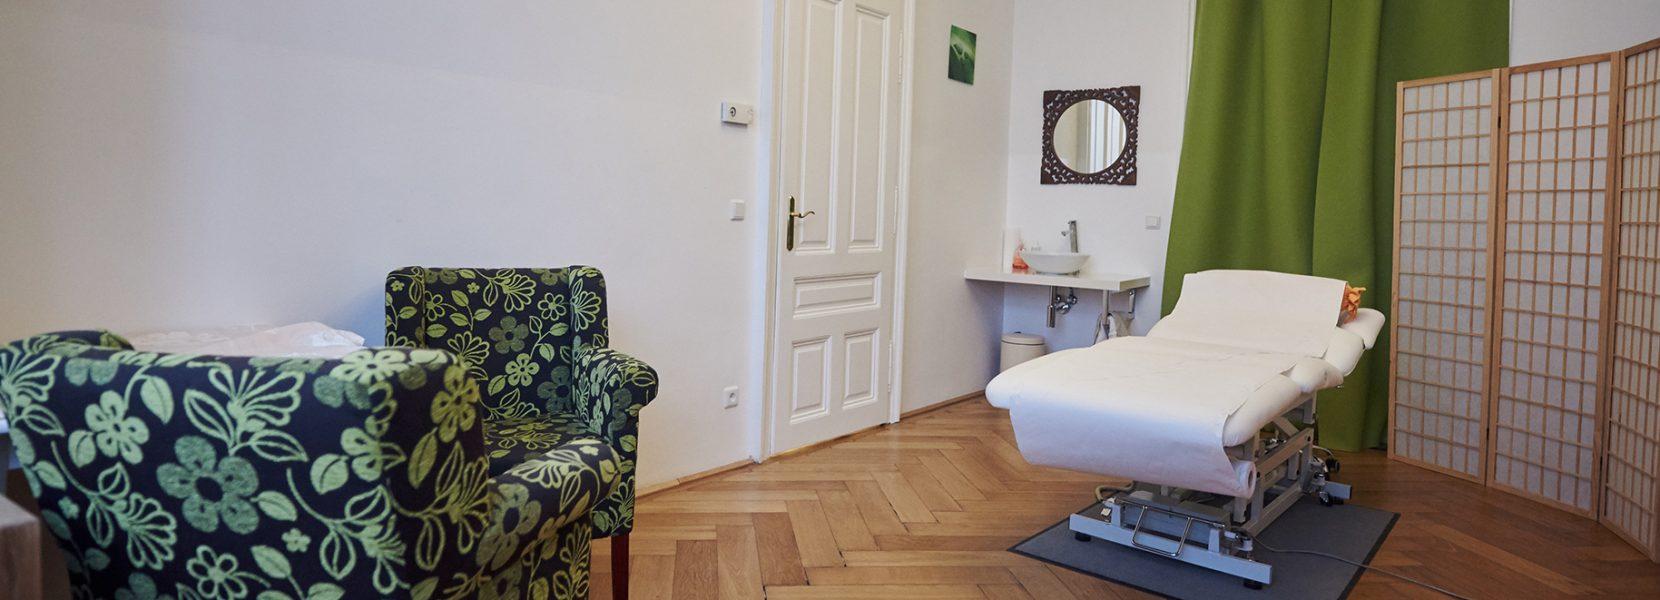 Praxis Margareten - Onkologie Praxis Wien